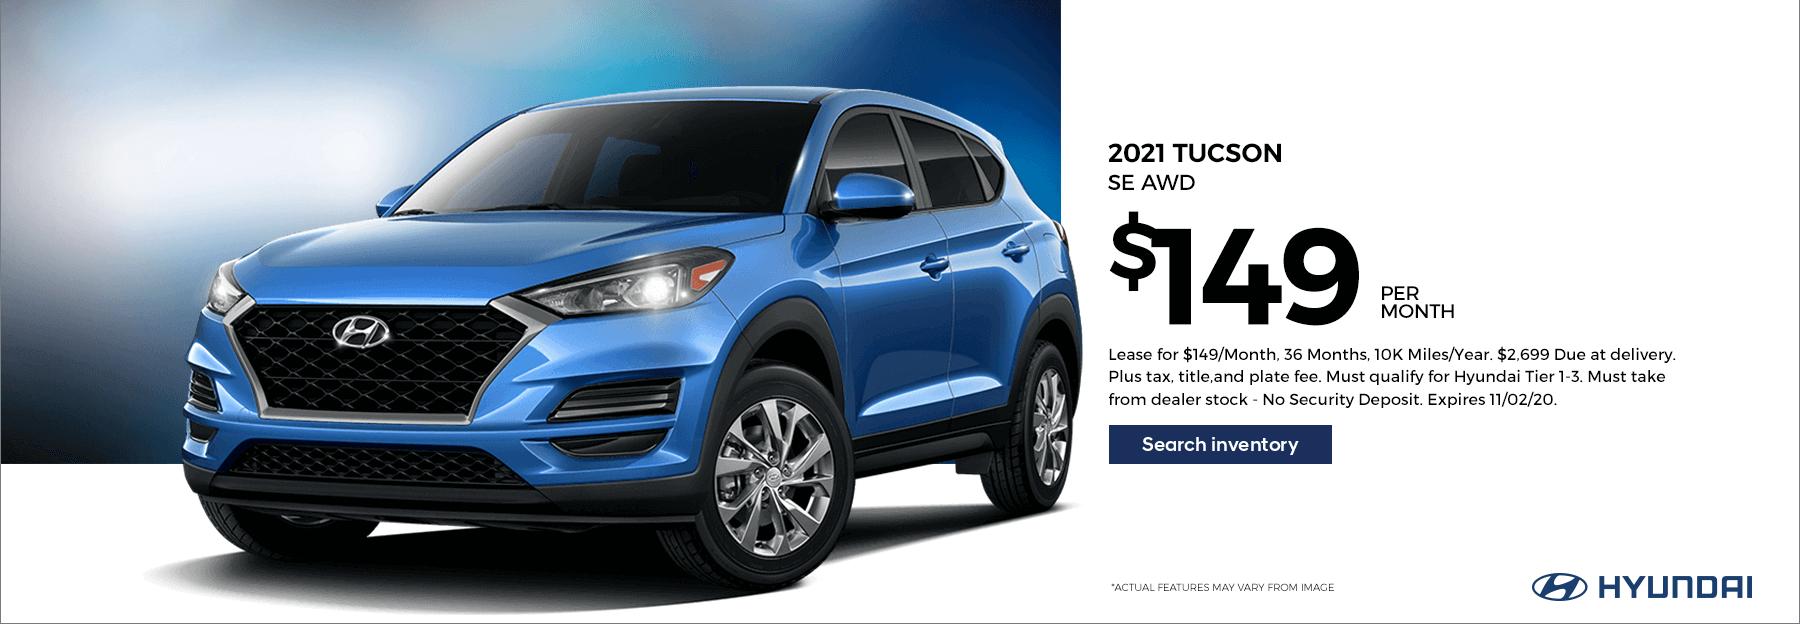 1800x625_Hyundai_Tucson_OCT